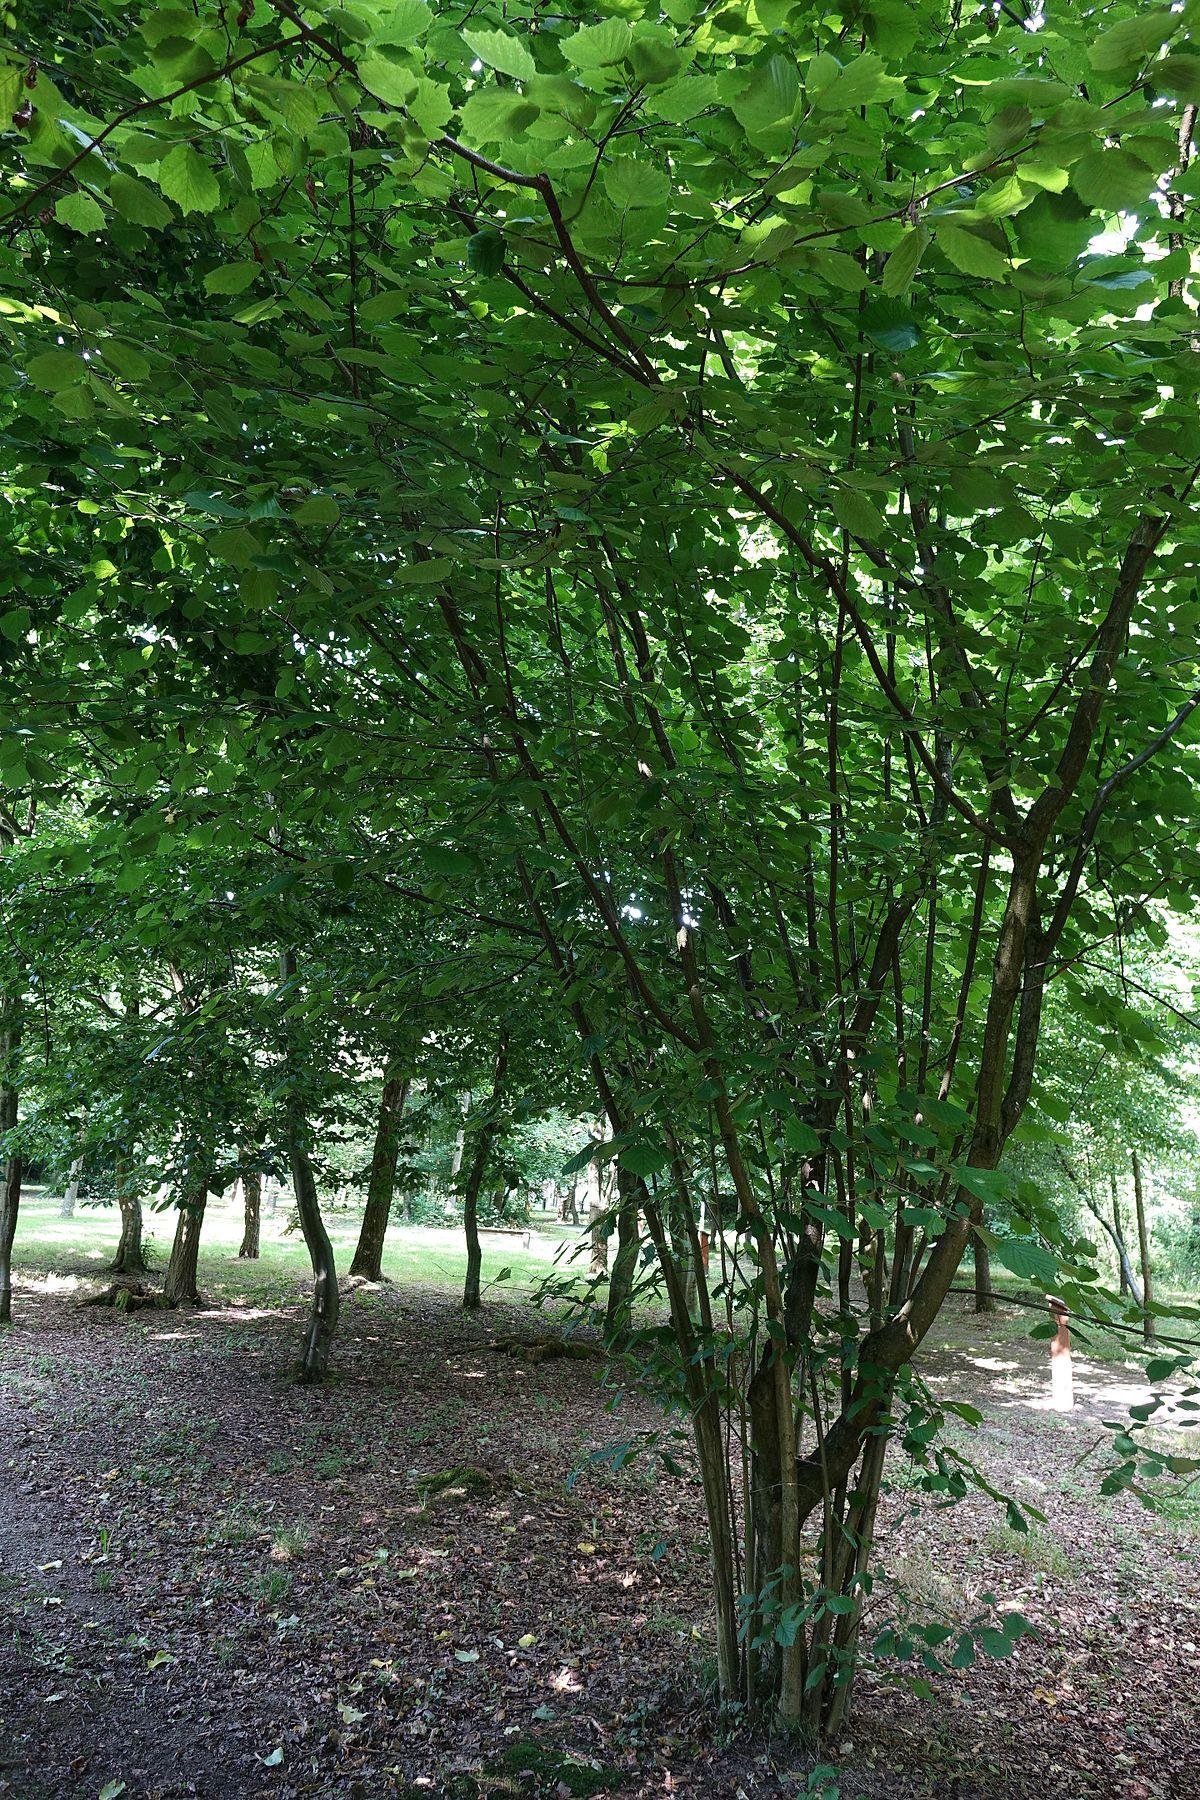 Coudraie wiktionnaire for Jardin wiktionnaire